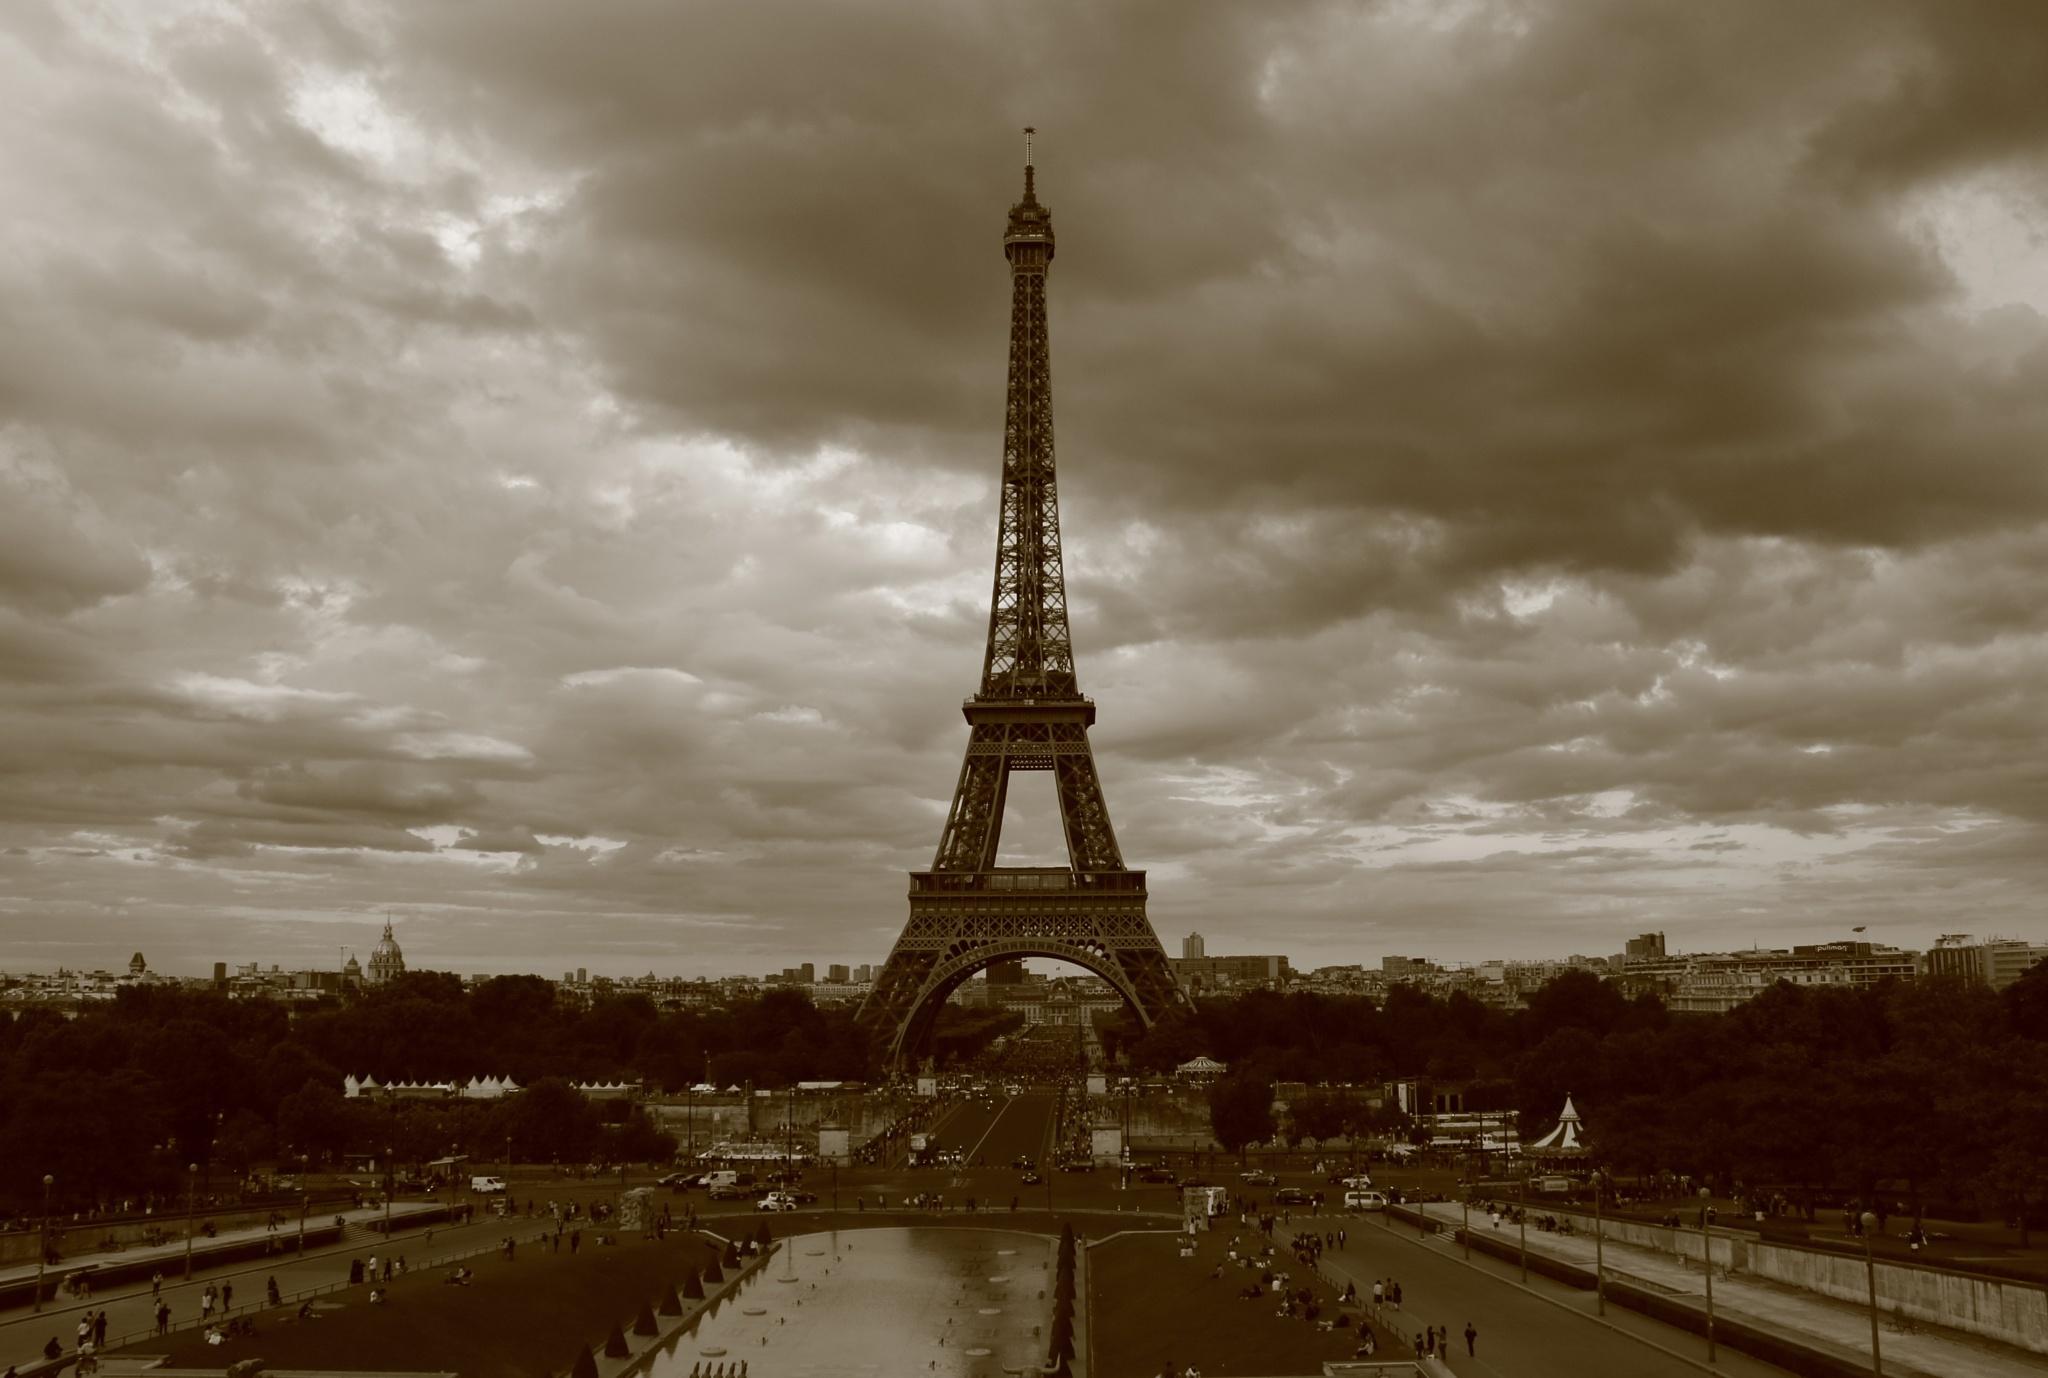 Eiffel Tower, Paris by David McColgan Photography